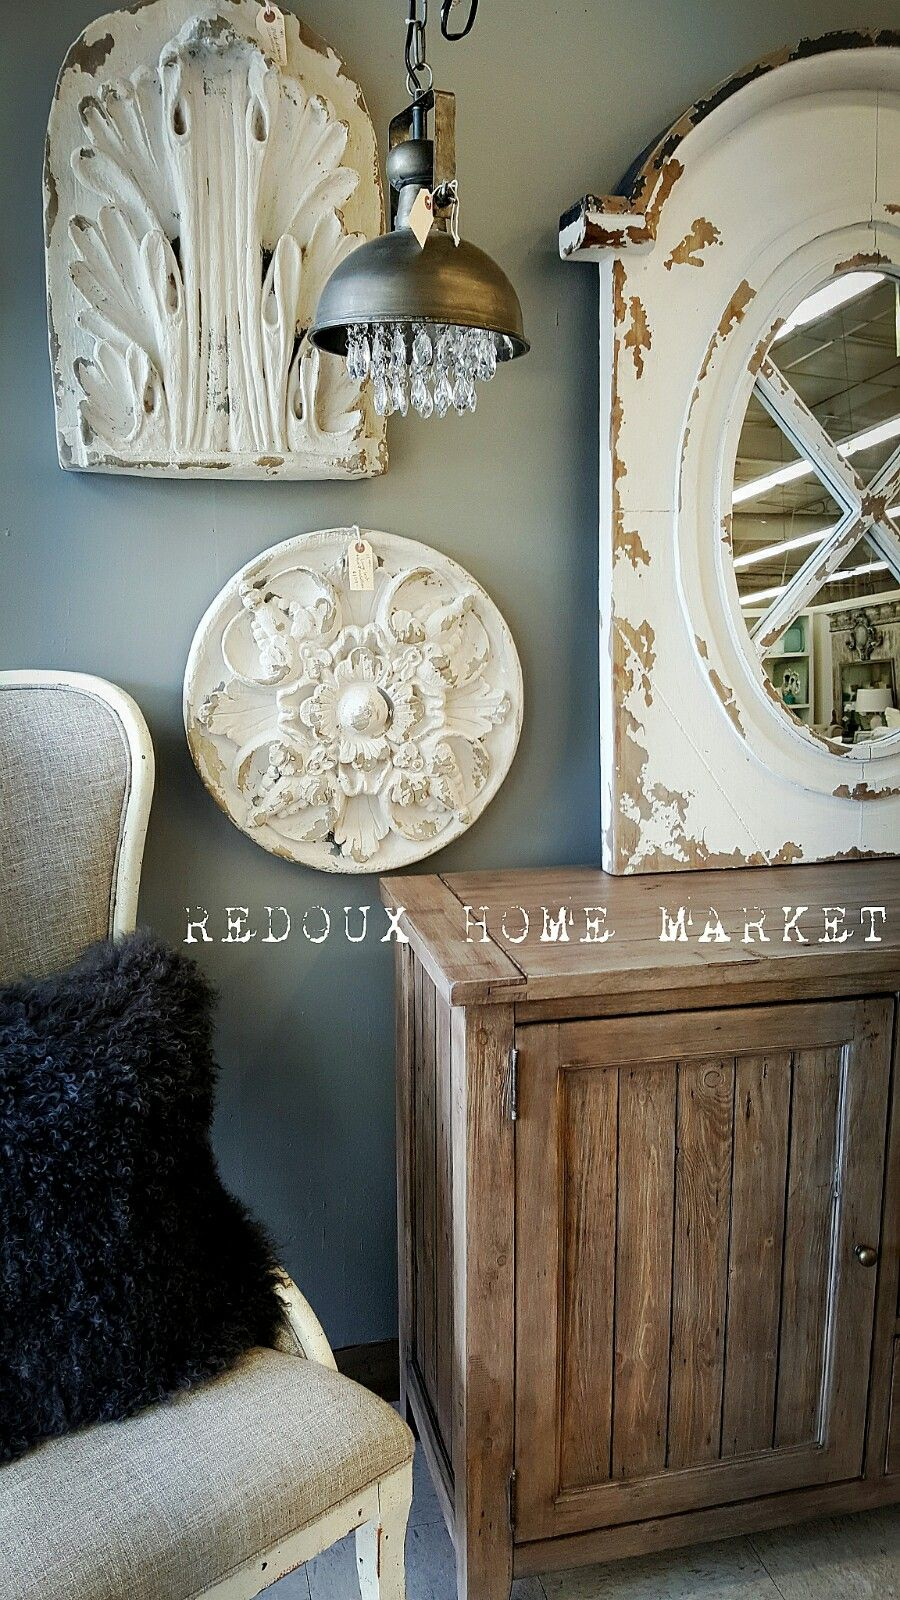 Farmhouse mirror with medallions